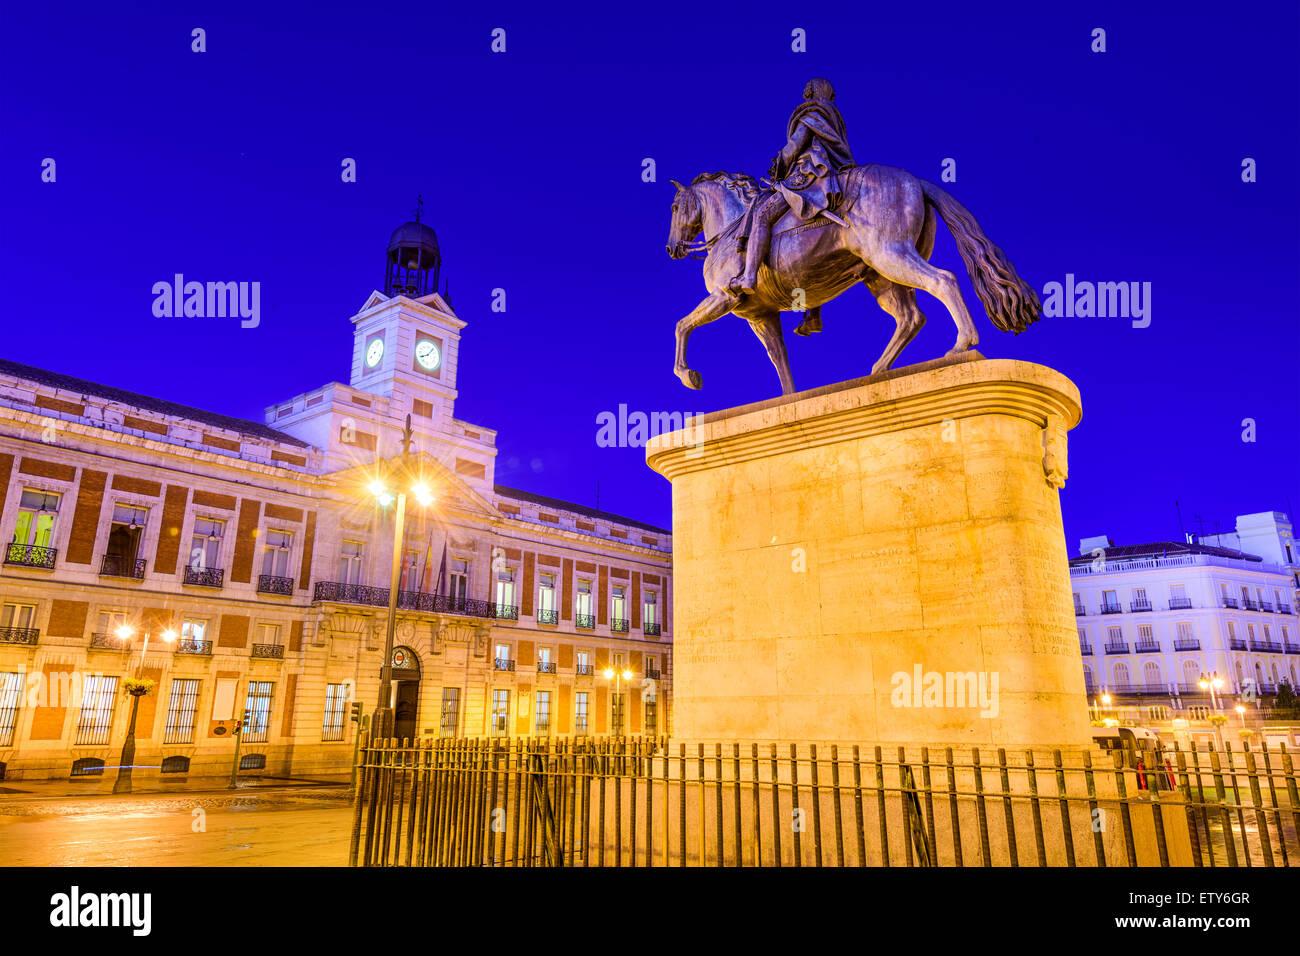 Madrid, Spain at Puerta del Sol. - Stock Image